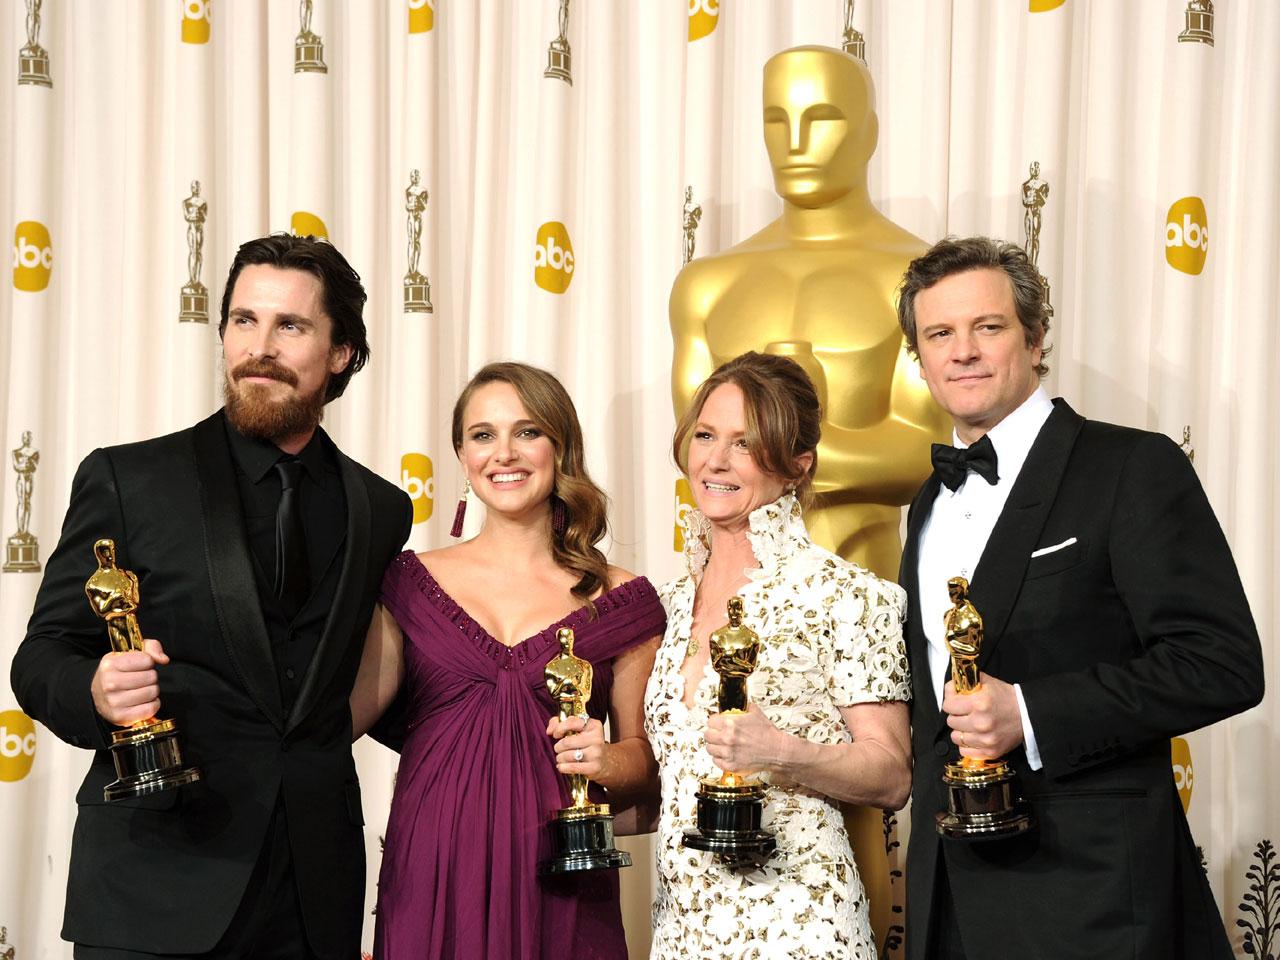 Oscar Winners 2011: The Complete List - CBS News